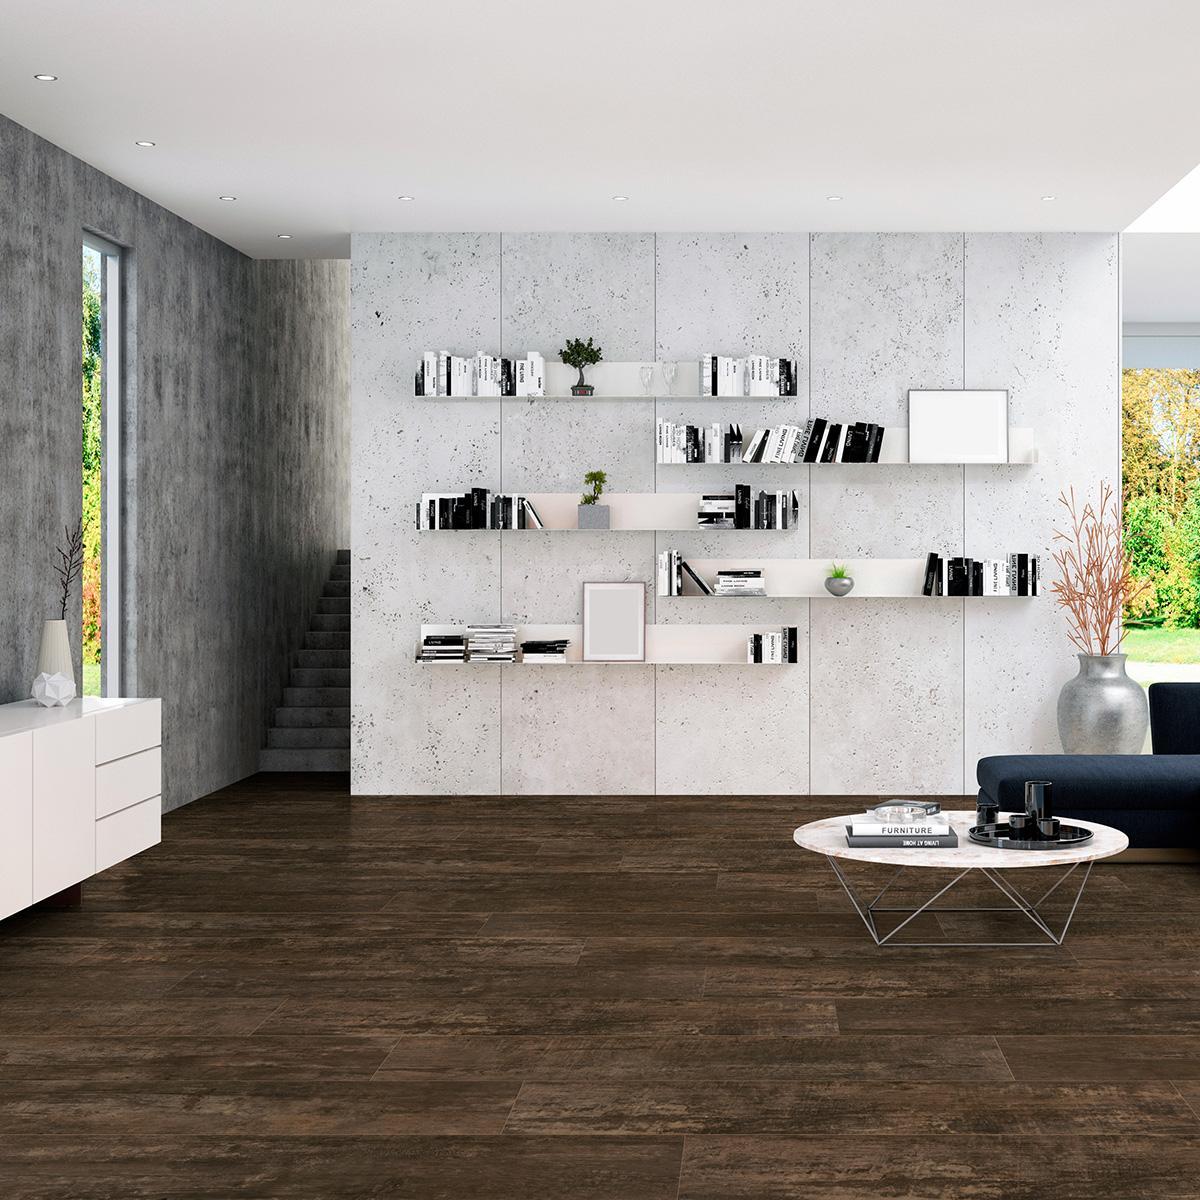 Piso PVC Manhattan Pino Niveus Mate - 18.4X12.2 - 2.24 m2